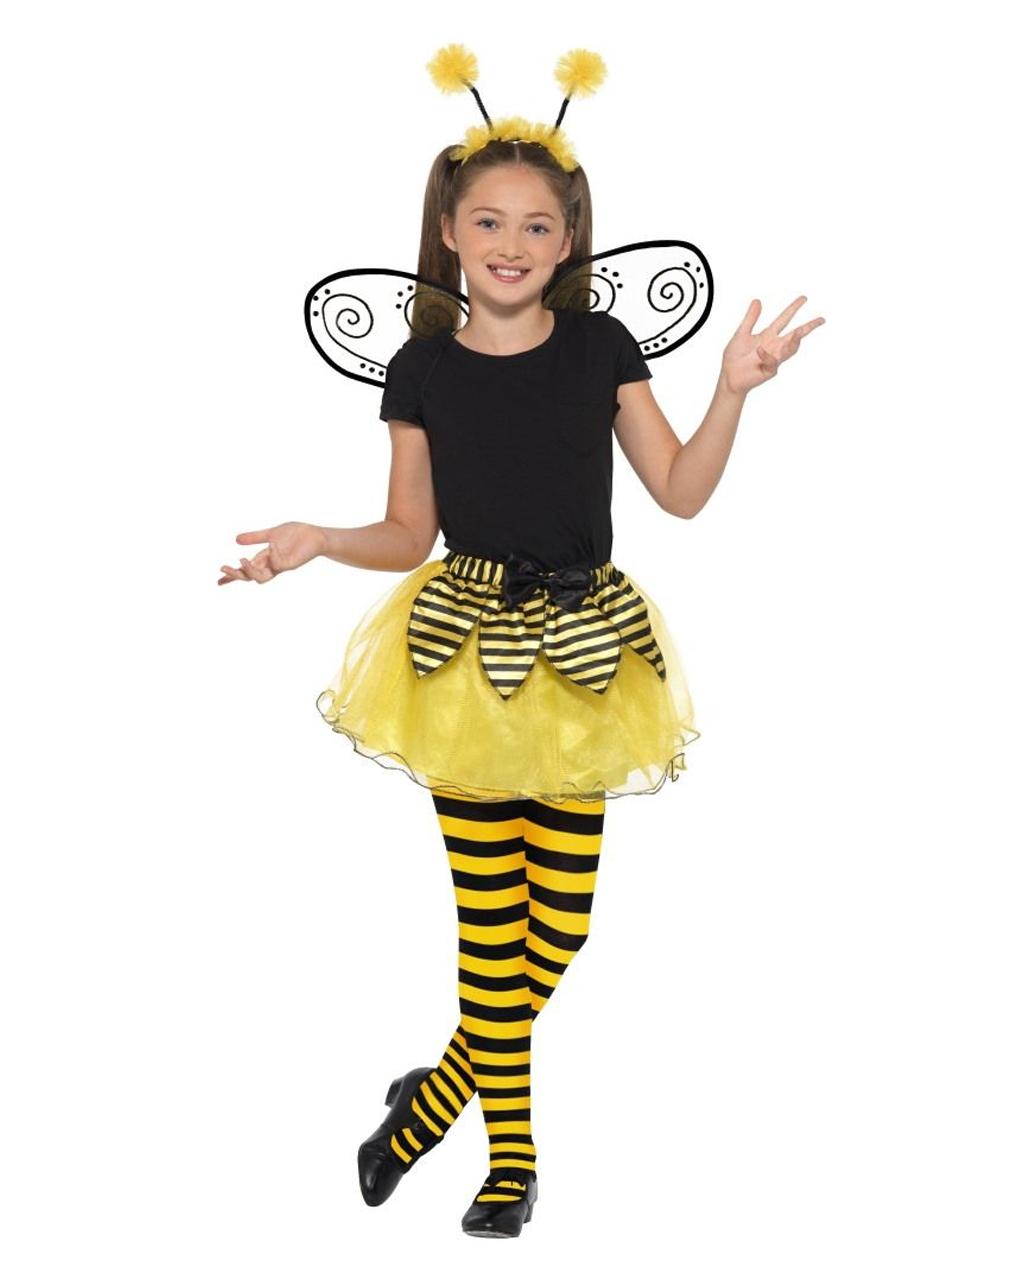 Bienen Kinder Kostumzubehor Set Kaufen Bei Horror Shop Com